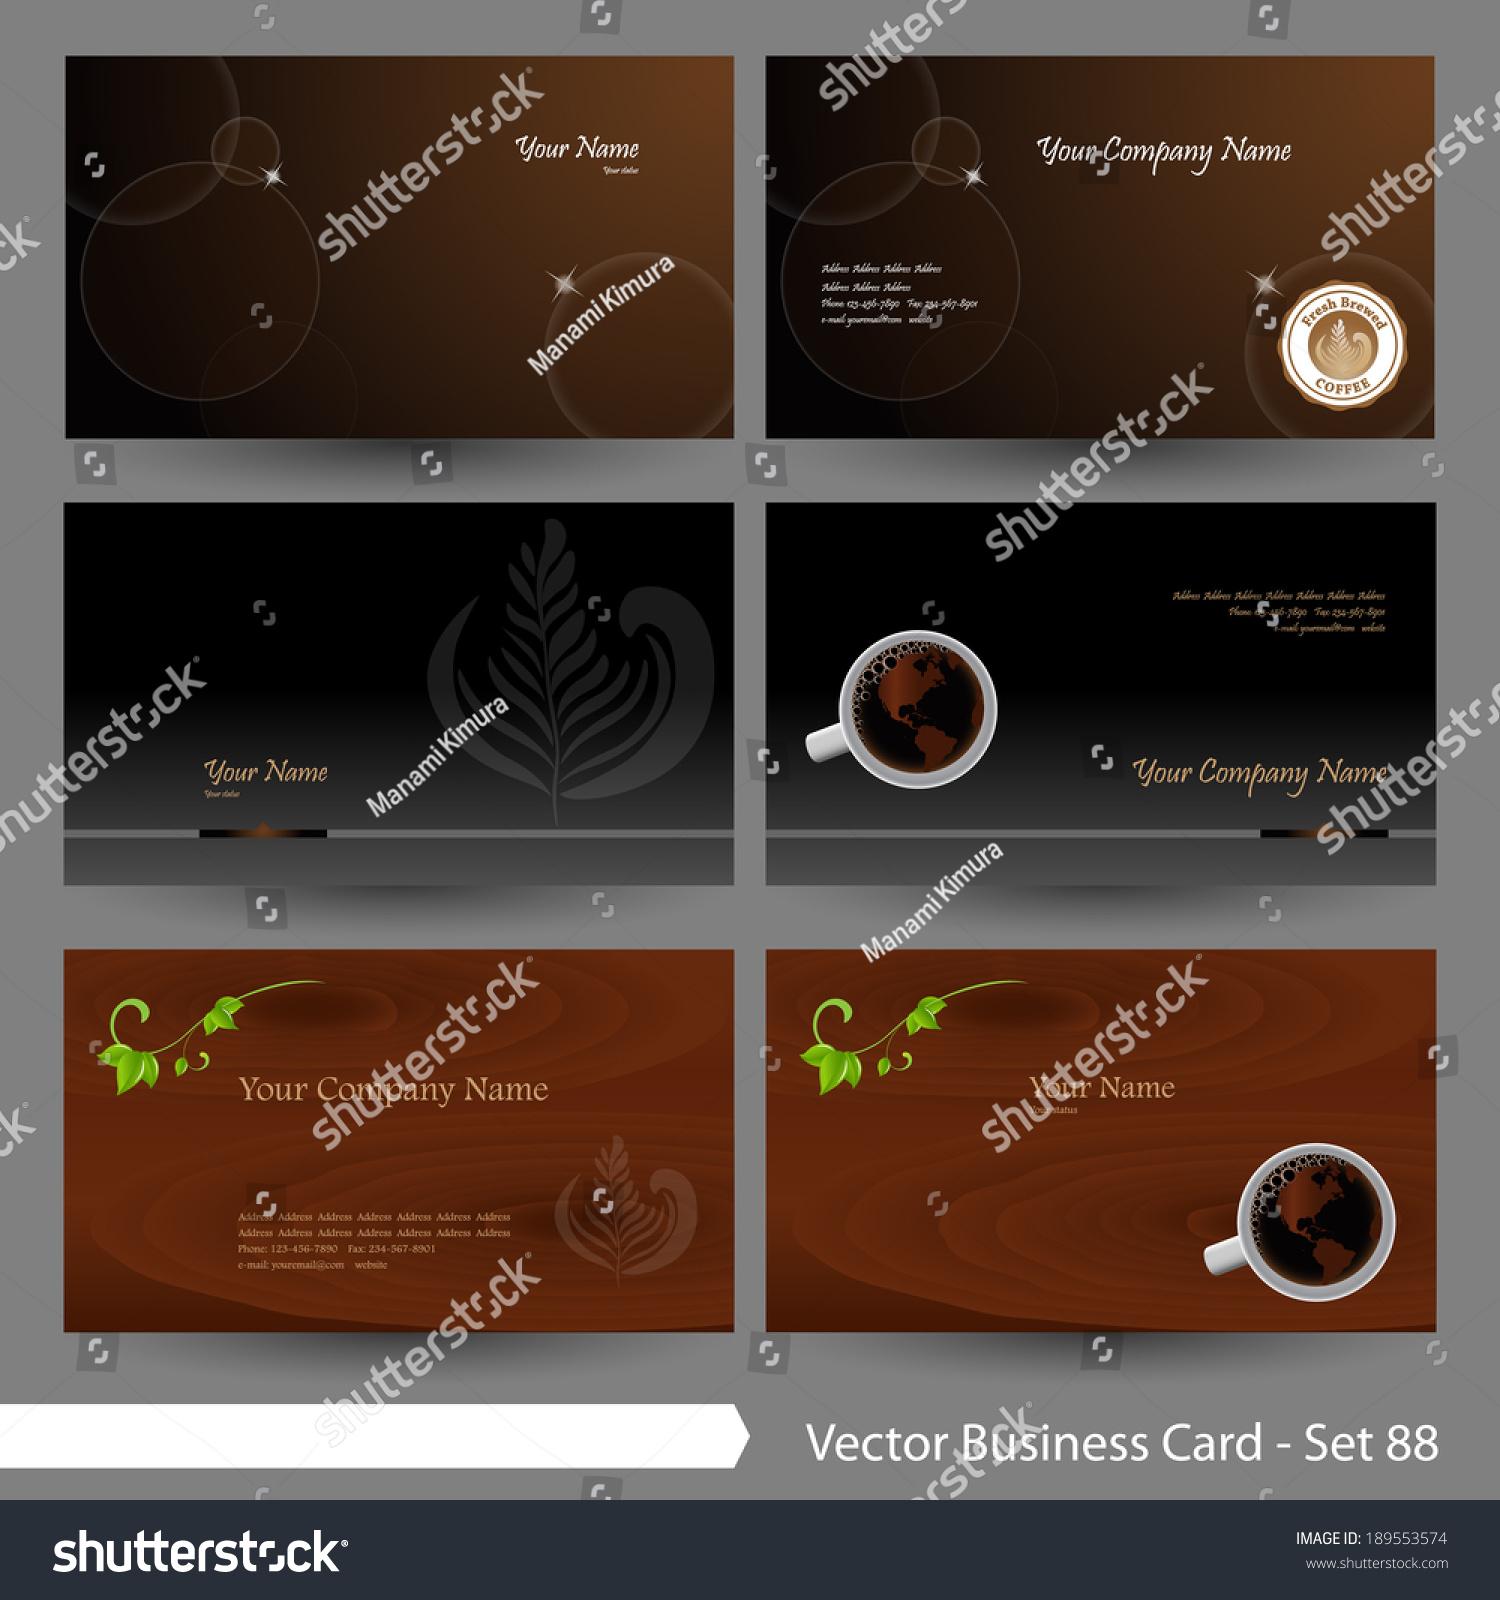 vector business card template set restaurant stock vector